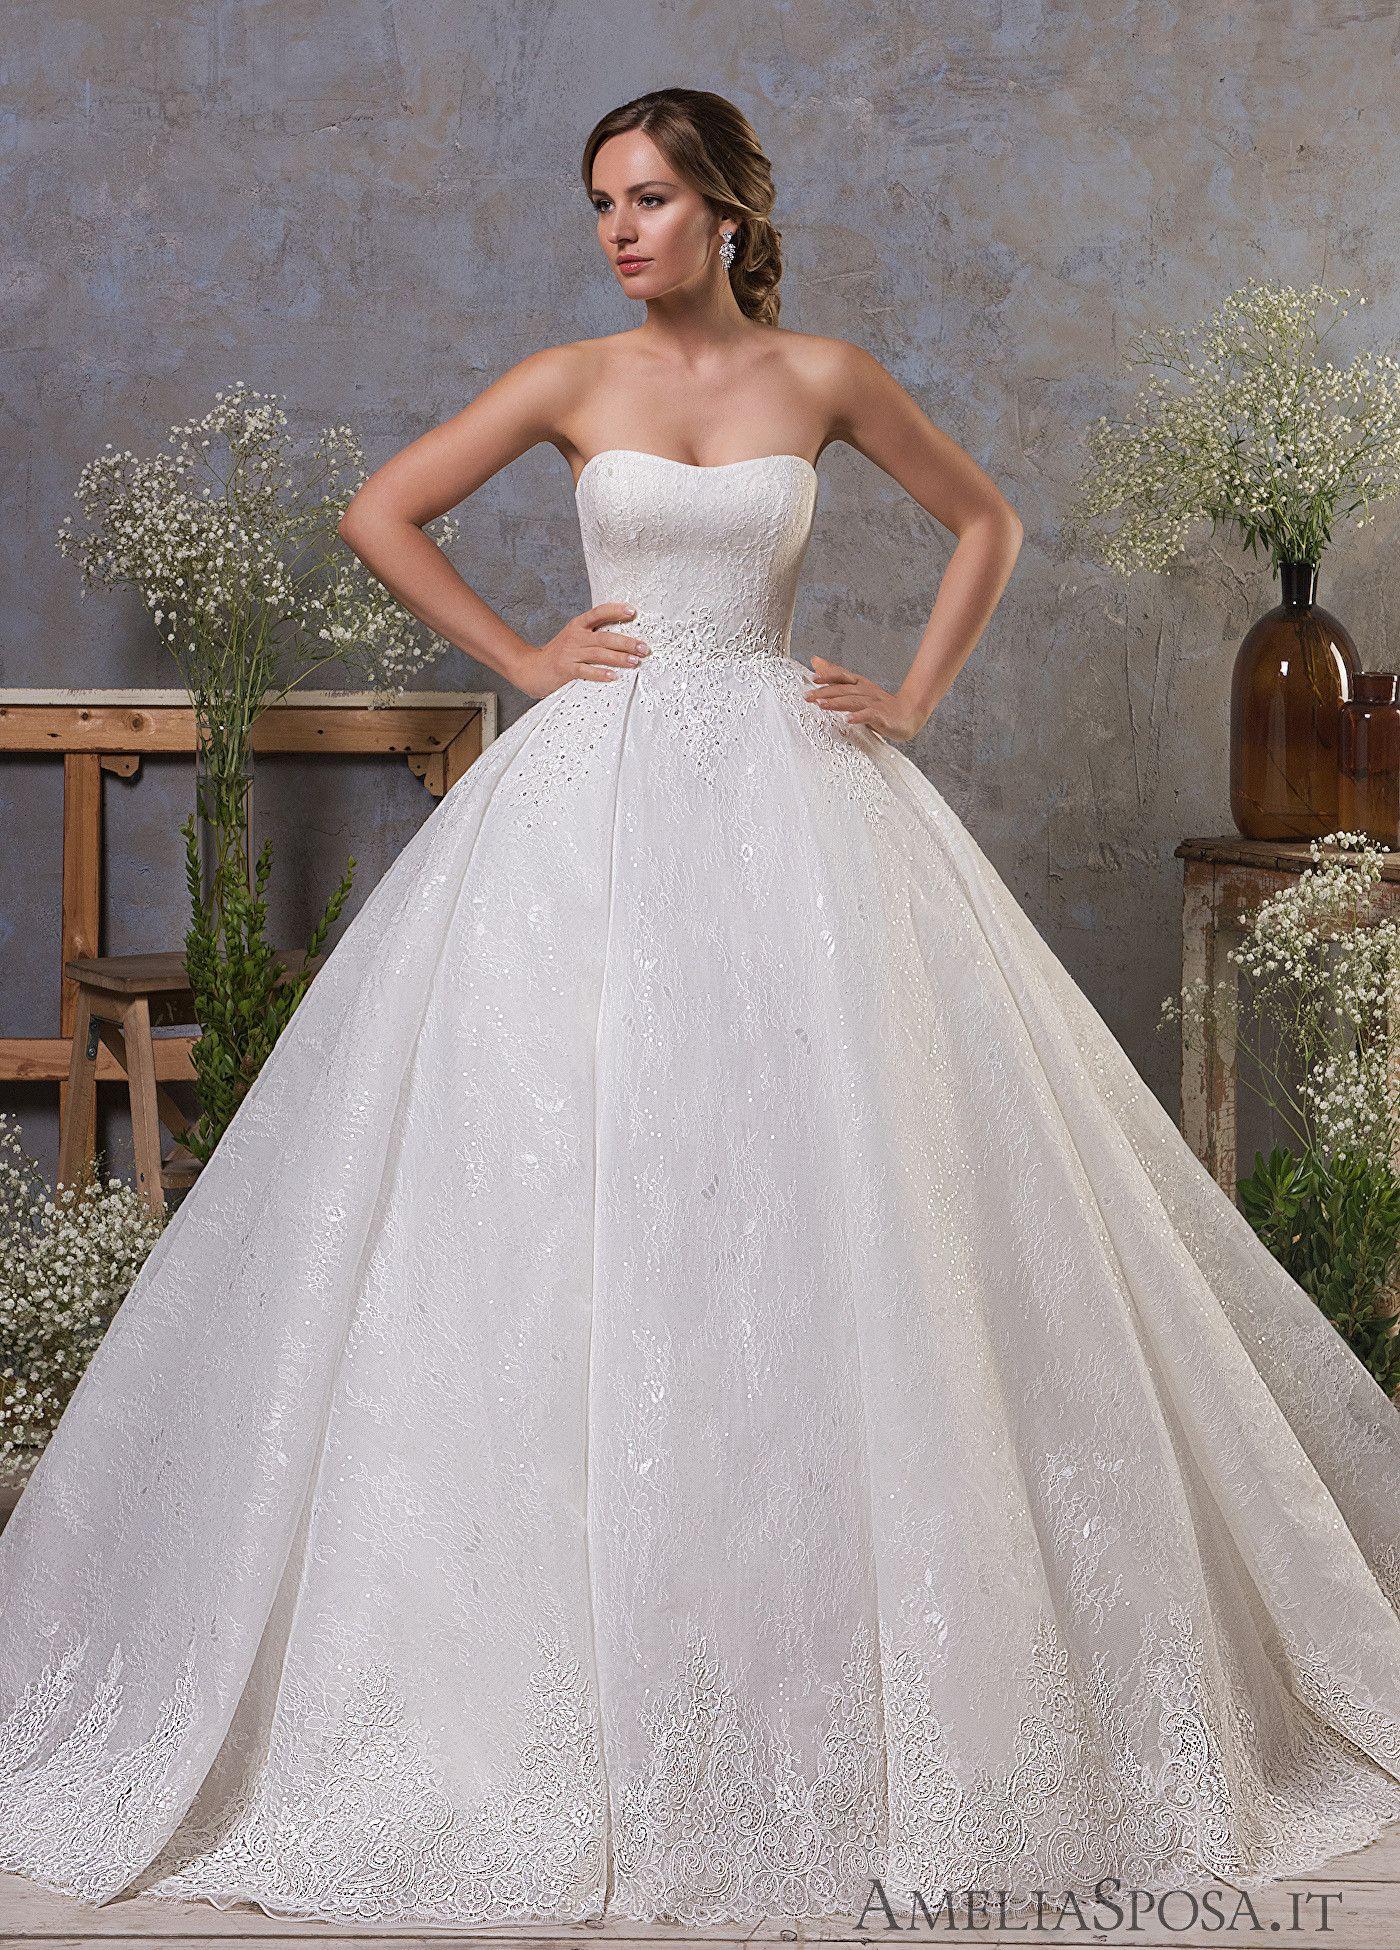 Elegant Lace Wedding Dresses 2019 Princess Off the Shoulder Bridal Gowns Ball Gown Vintage Formal Dress for Bride Zipper Back with Button